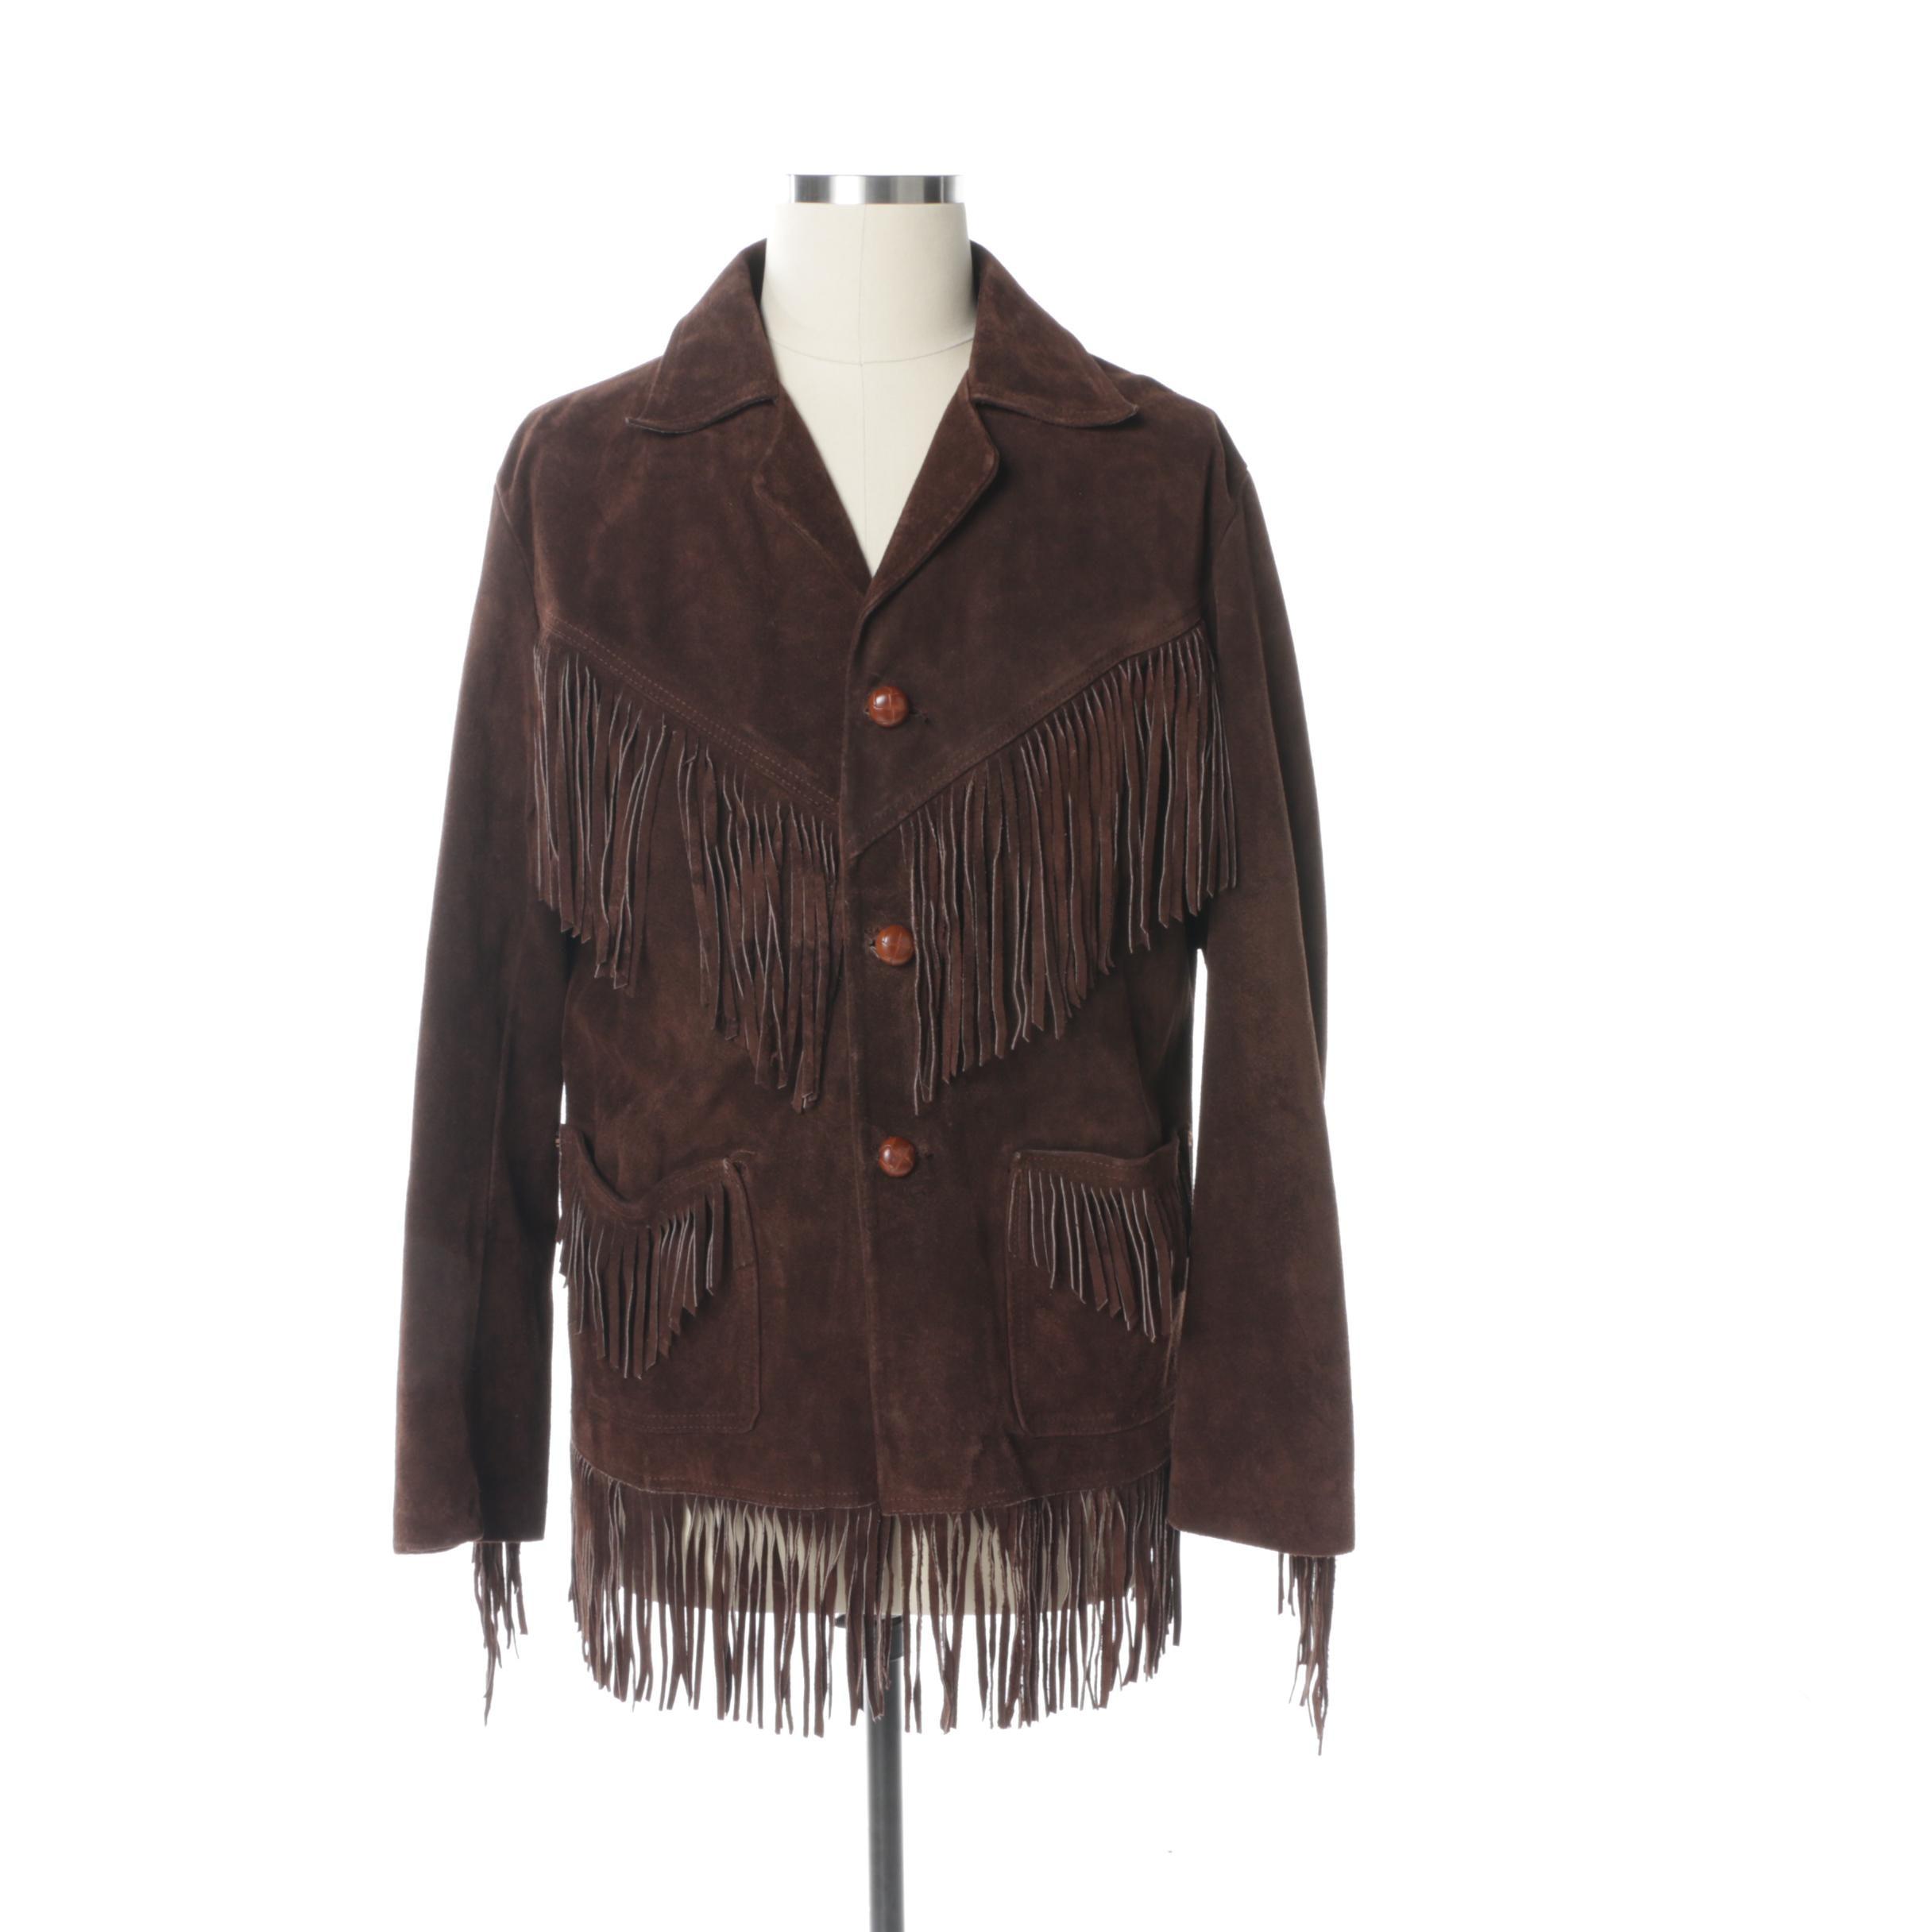 Men's Vintage Brown Suede Jacket